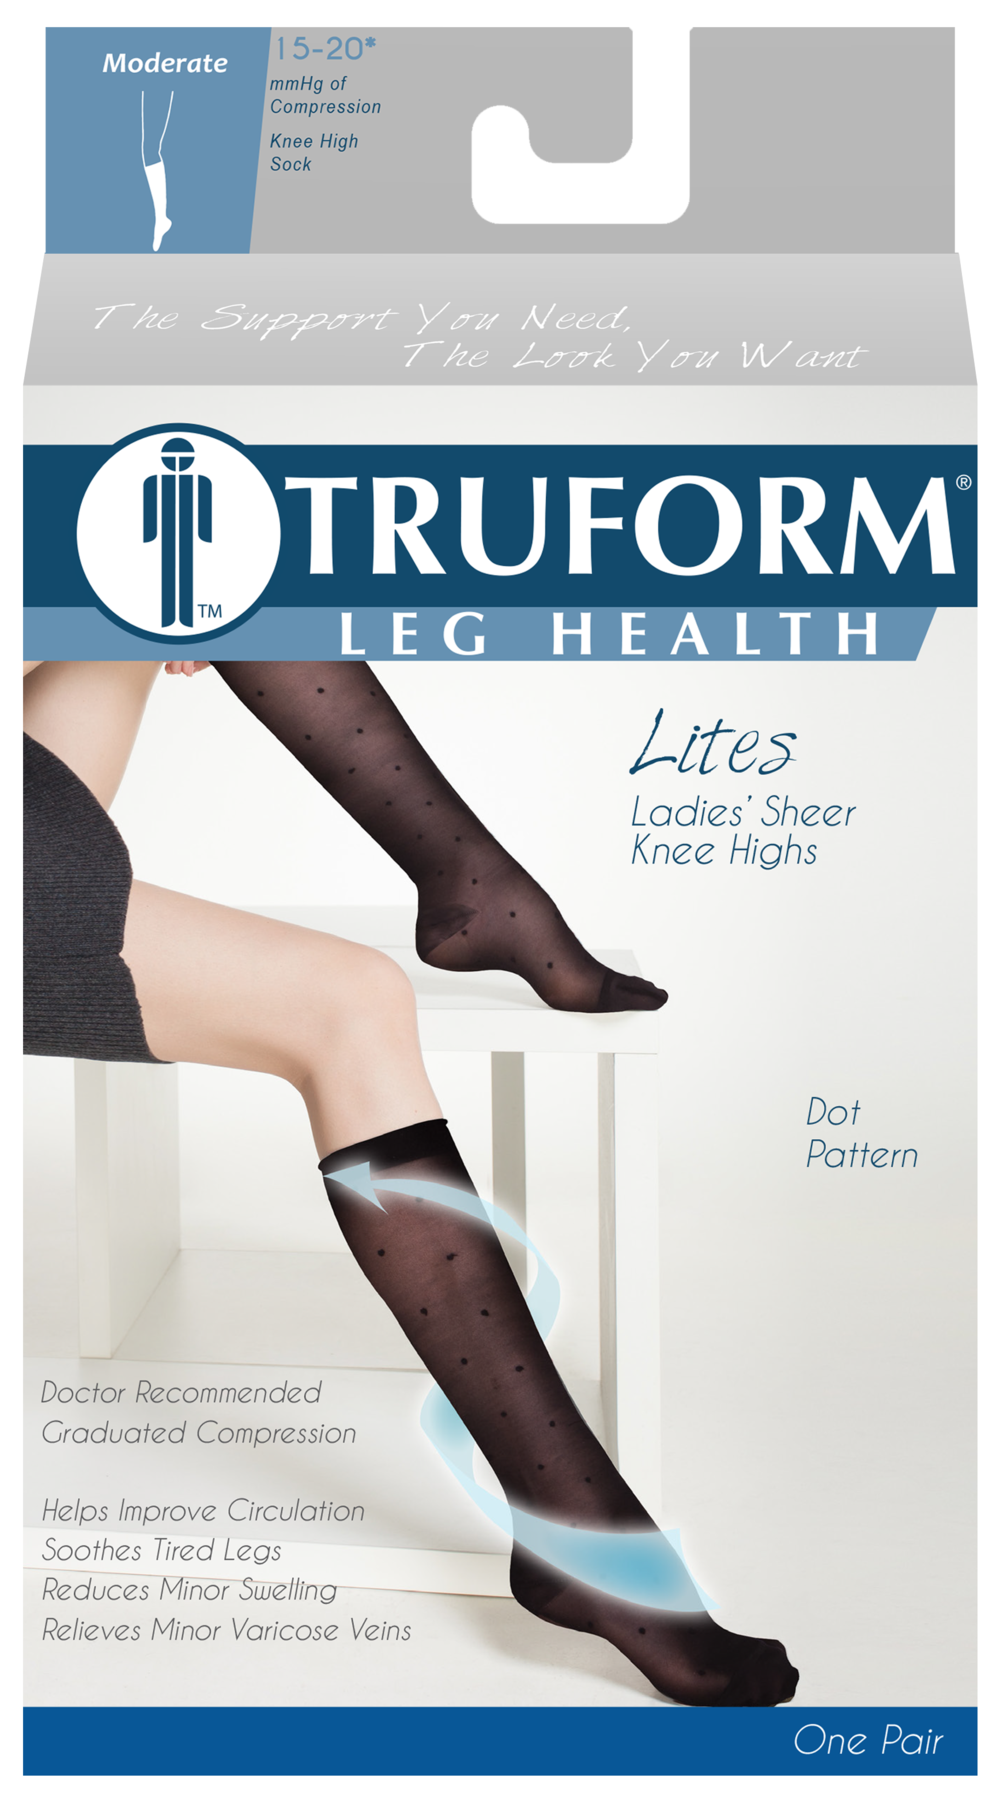 Truform, 1782, 15-20mmHg, Sheer, Dot Pattern, Knee High, Package